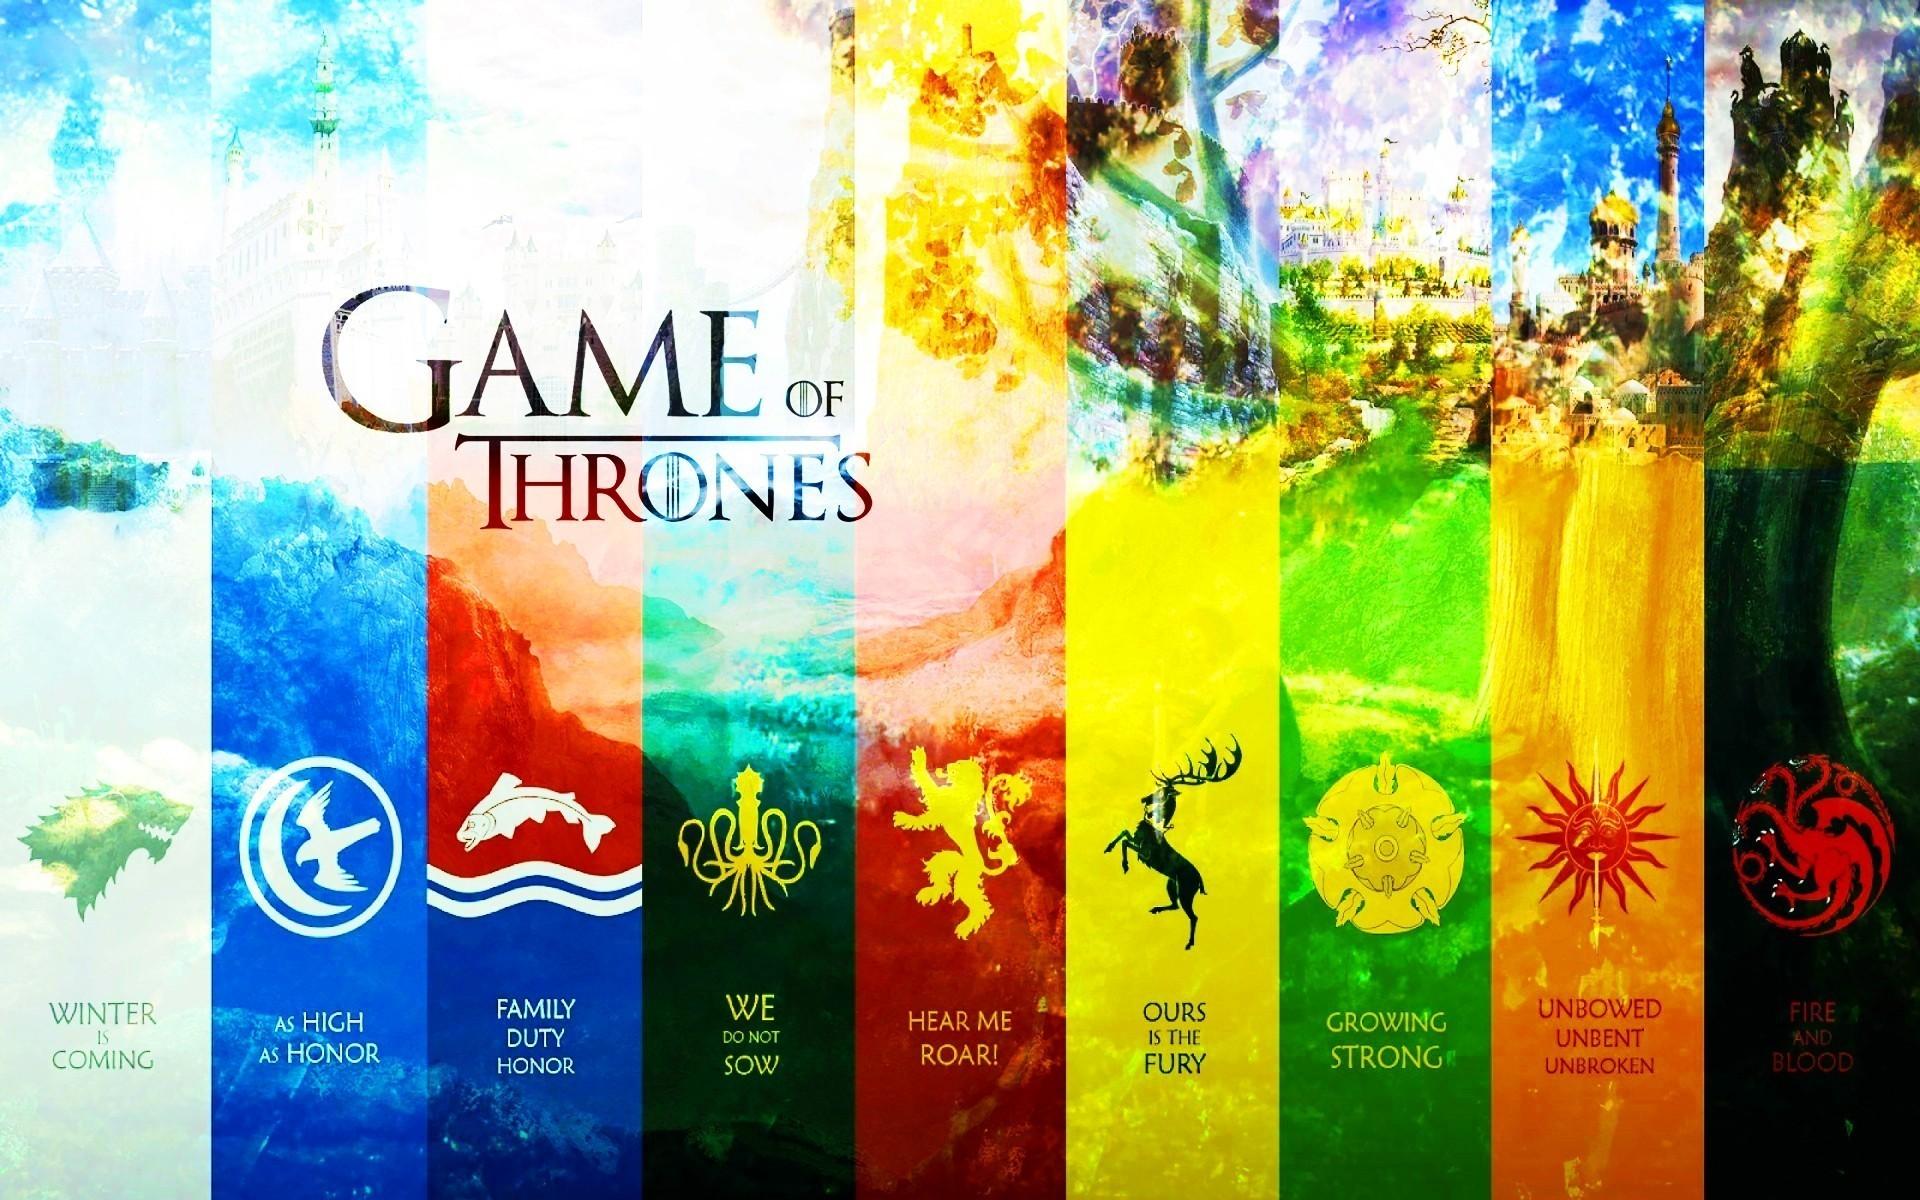 Game of thrones house arryn baratheon greyjoy lannister wallpaper